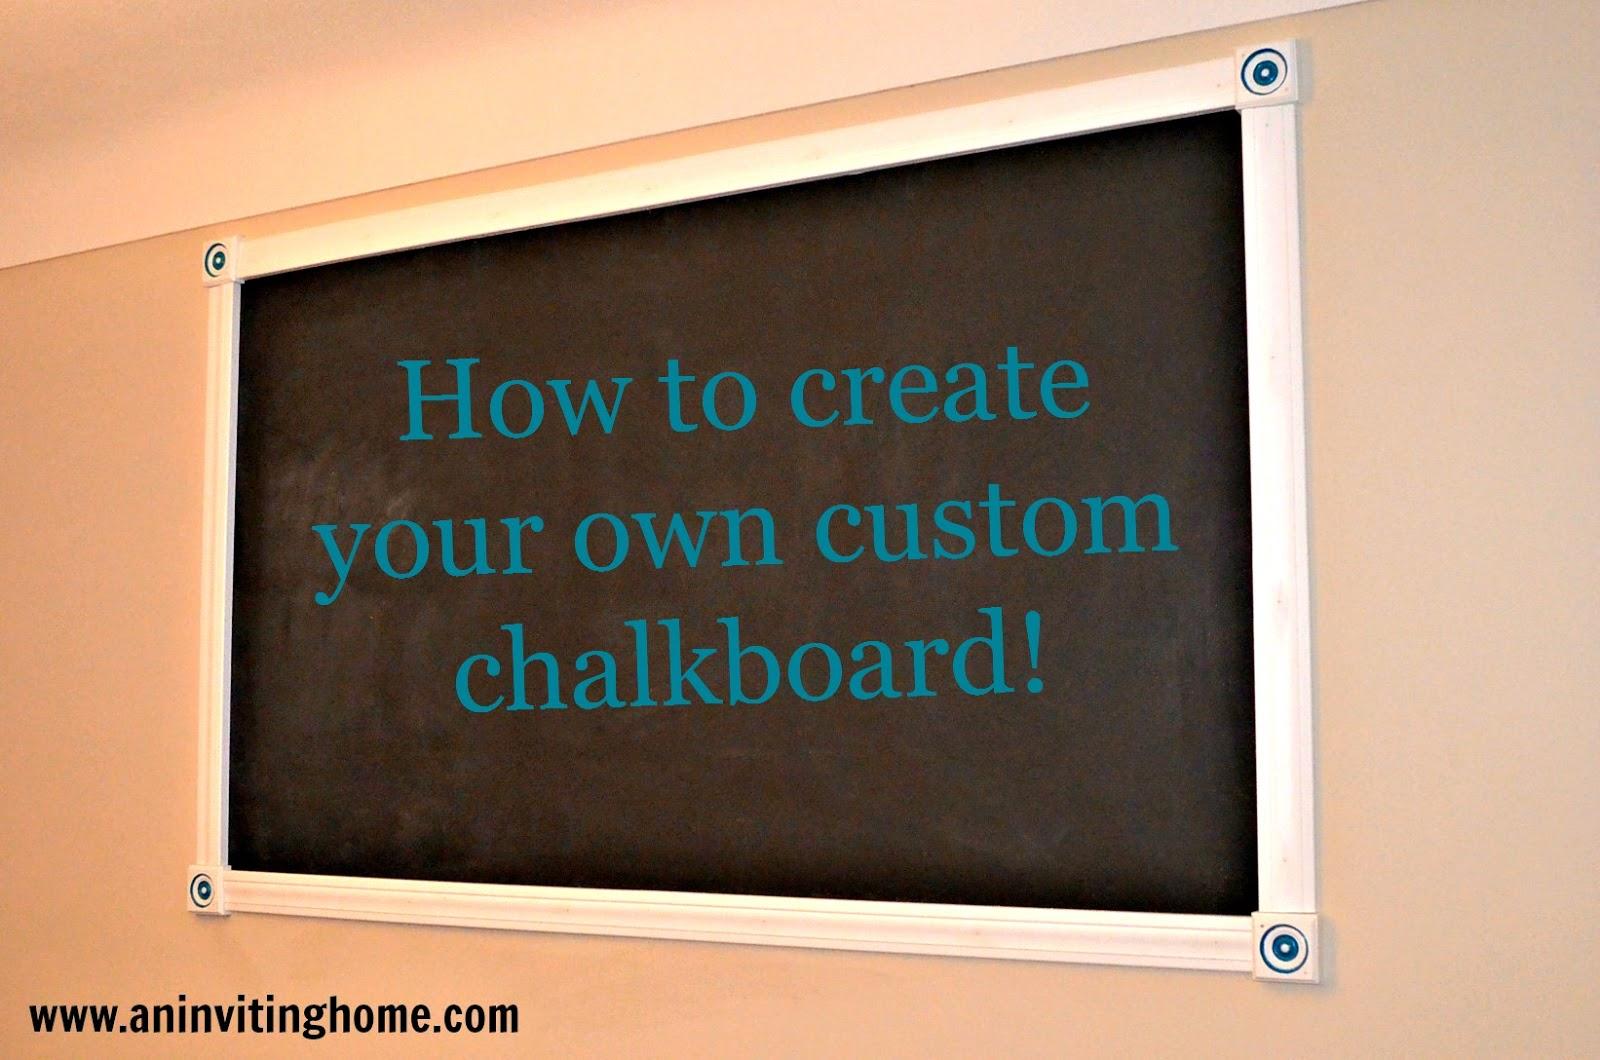 how to create customized - photo #2